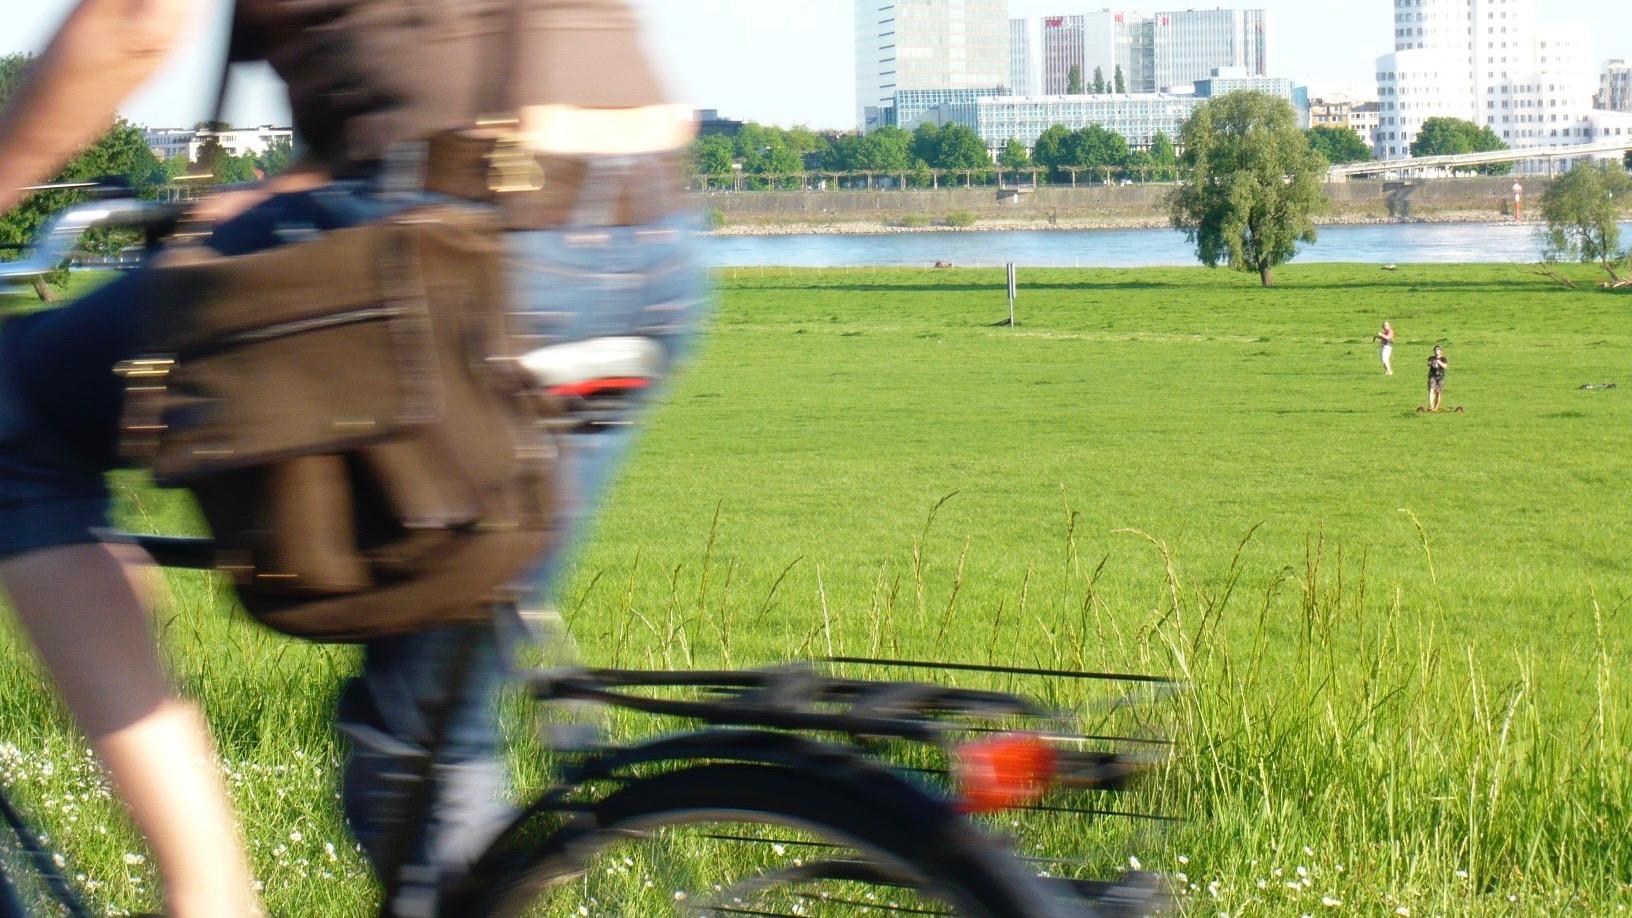 PolitikerINNen auf's Fahrrad